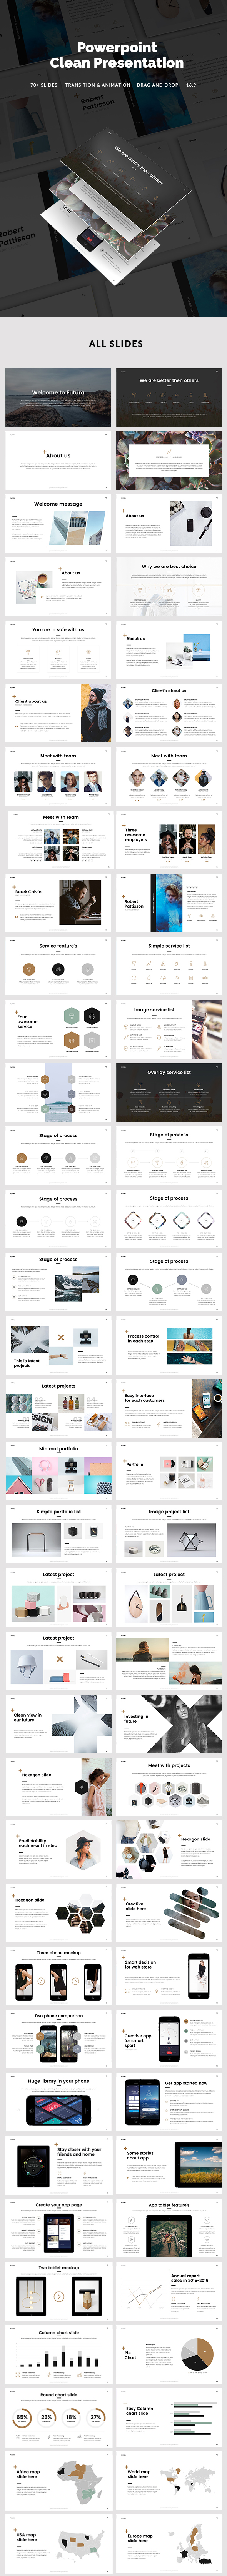 Minimal Presentation - PowerPoint Templates Presentation Templates